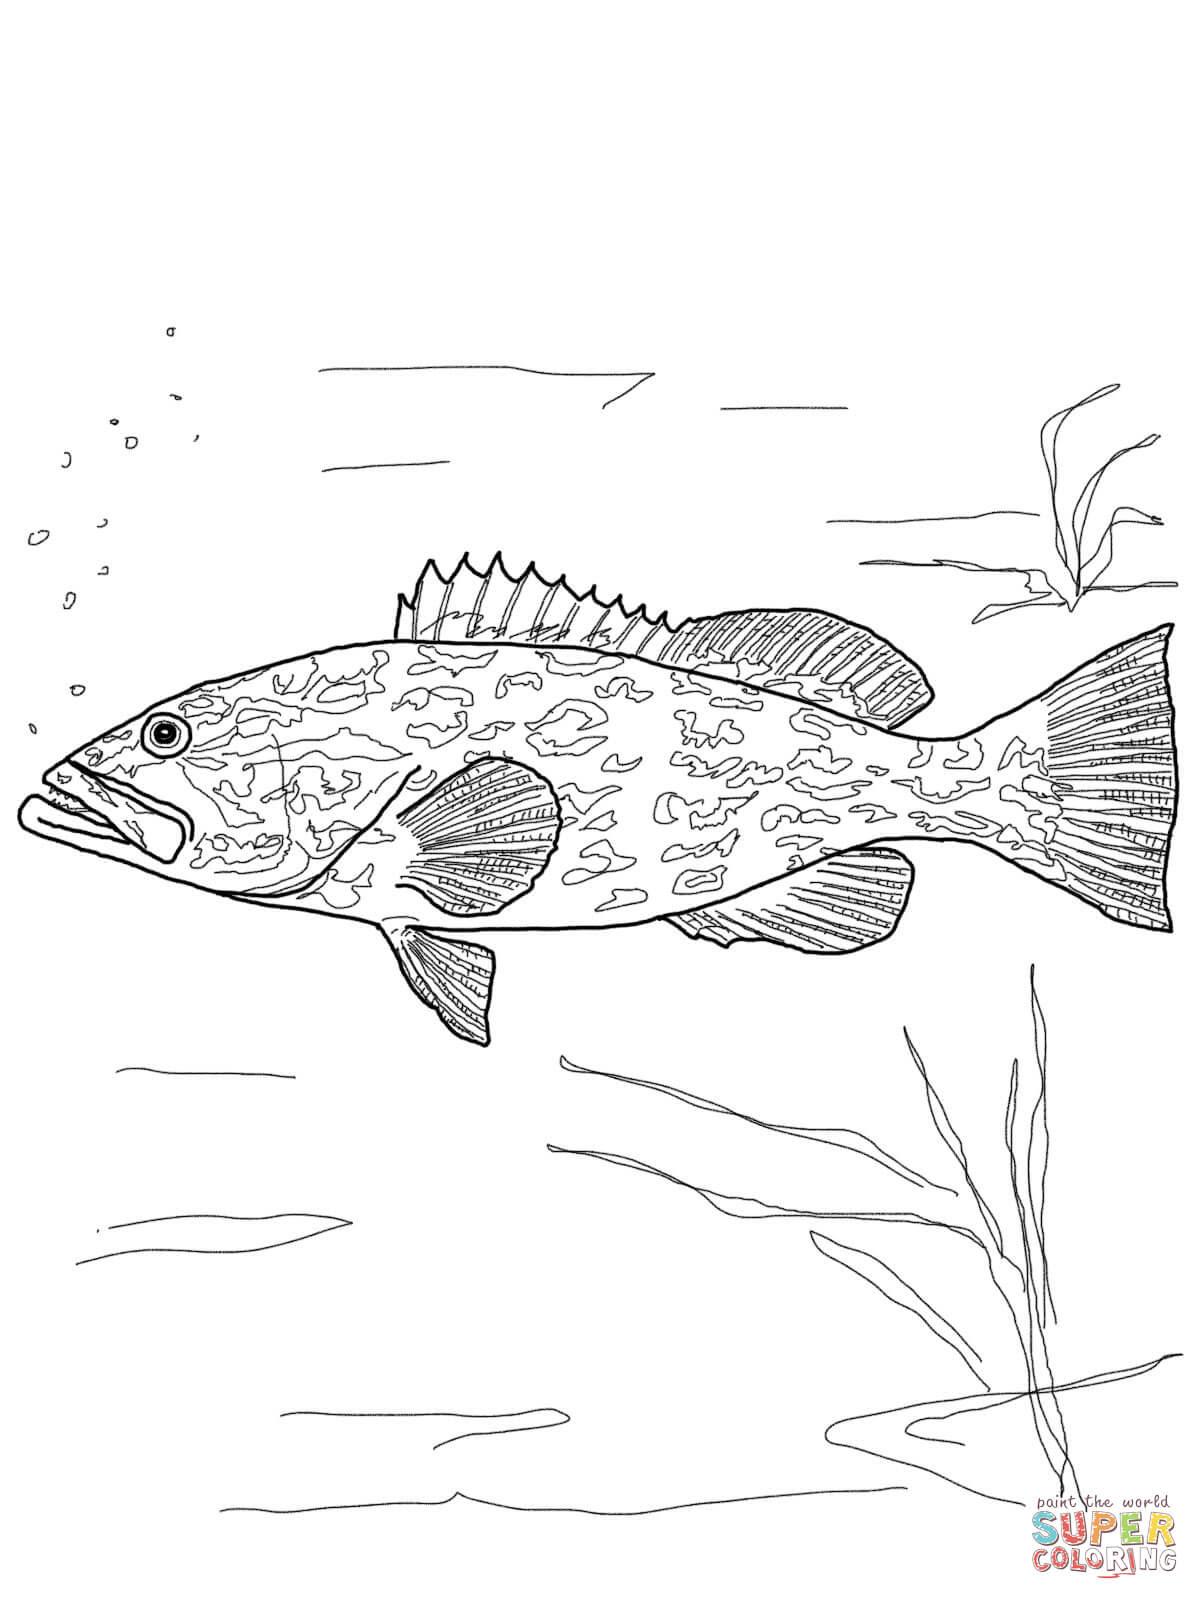 Yellowfin Tuna Drawing at GetDrawings | Free download